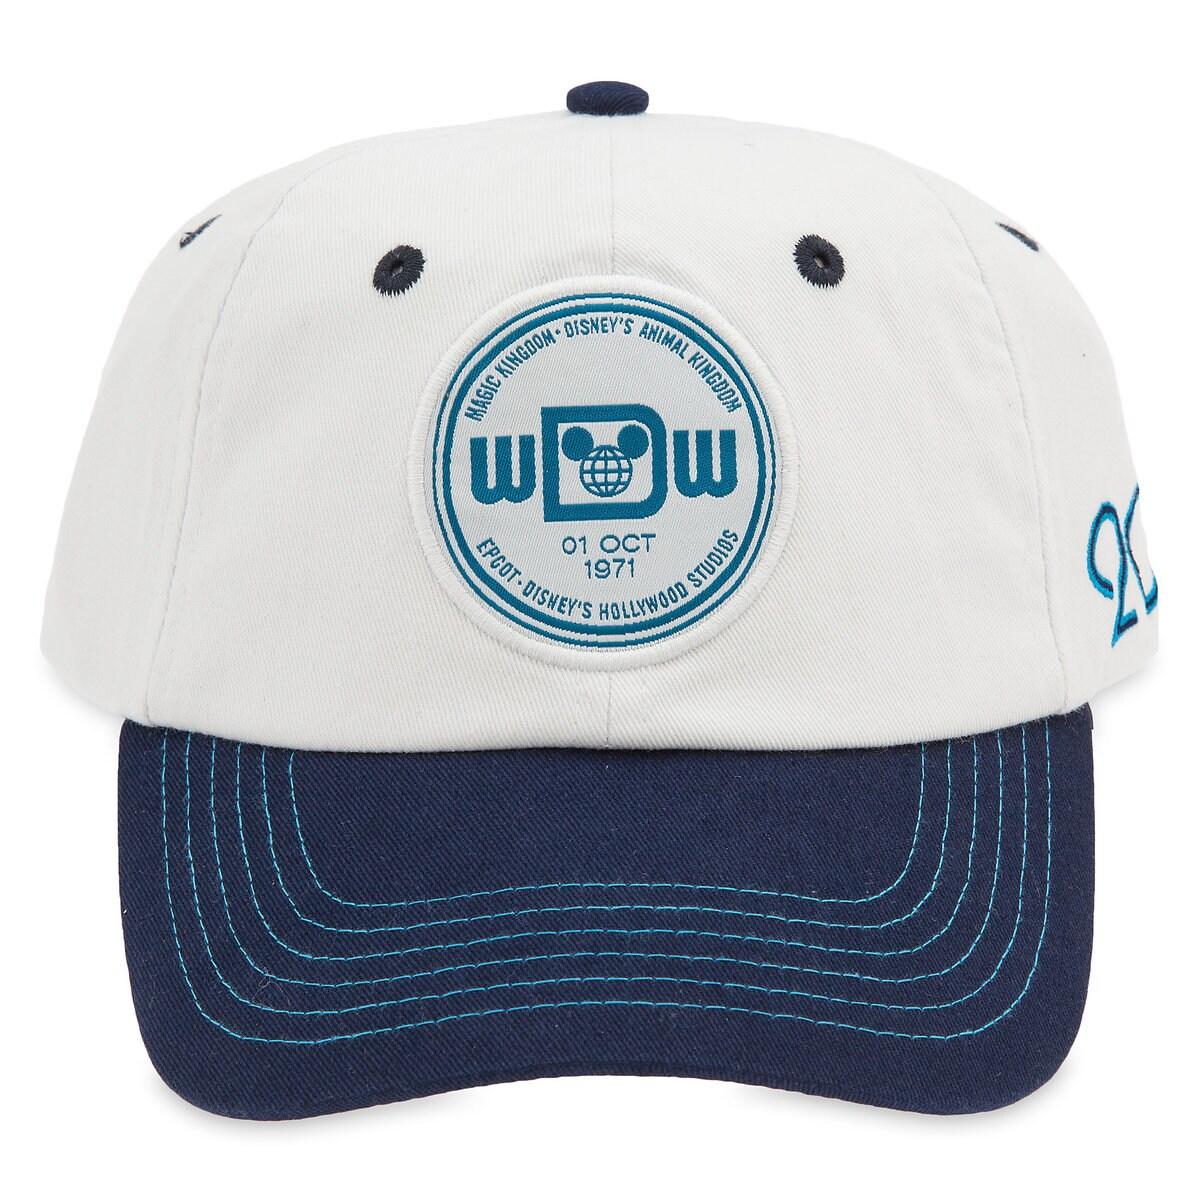 282fe4408f6a1e Product Image of Walt Disney World Baseball Cap for Adults - 2019 # 1